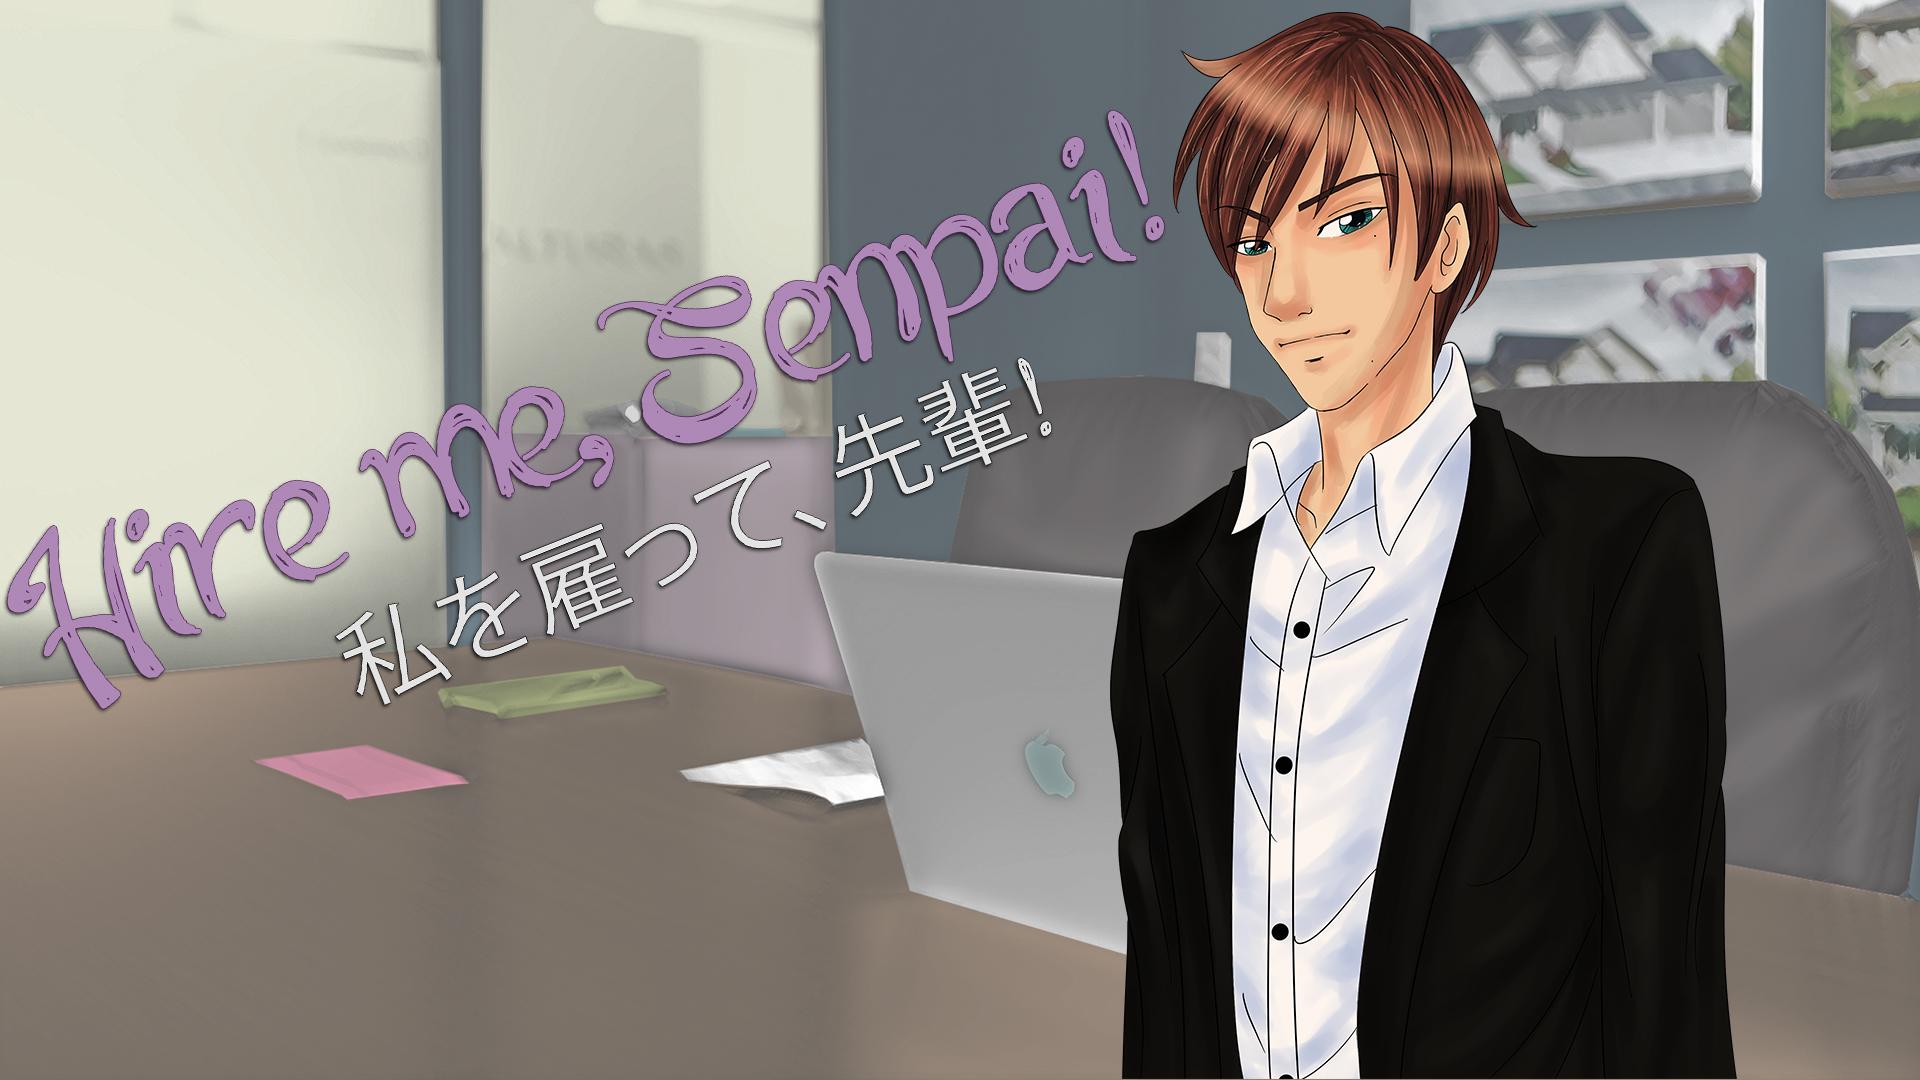 Hire me, Senpai!